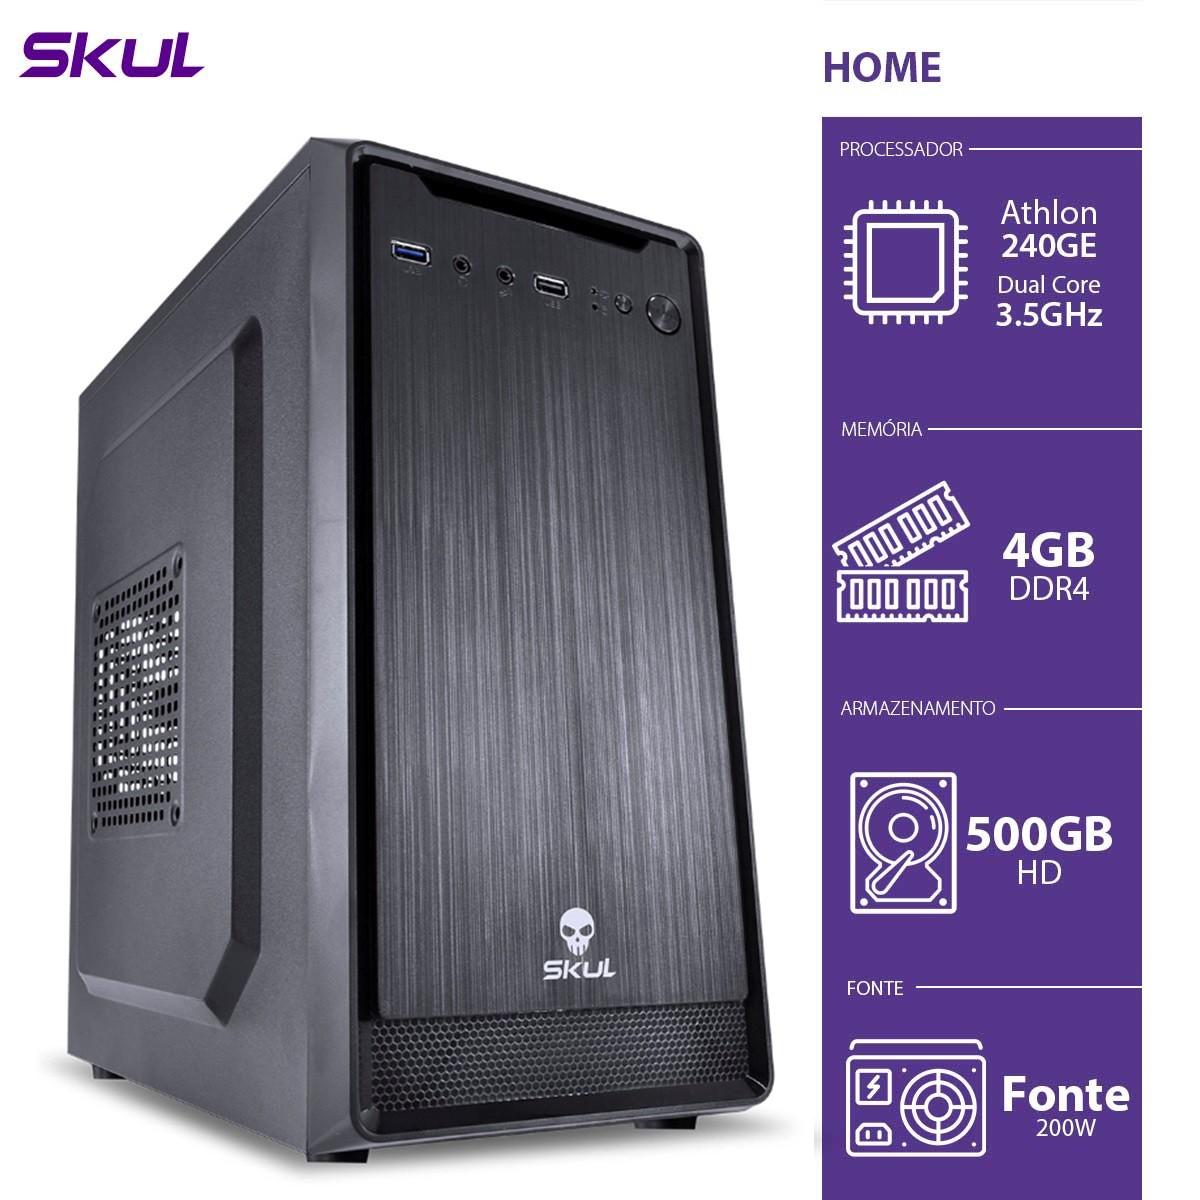 Computador Home H200 - ATHLON Dual Core 240GE 3.5GHZ 4GB DDR4 HD 500GB HDMI/VGA Fonte 200W - H240GE5004 - SKUL